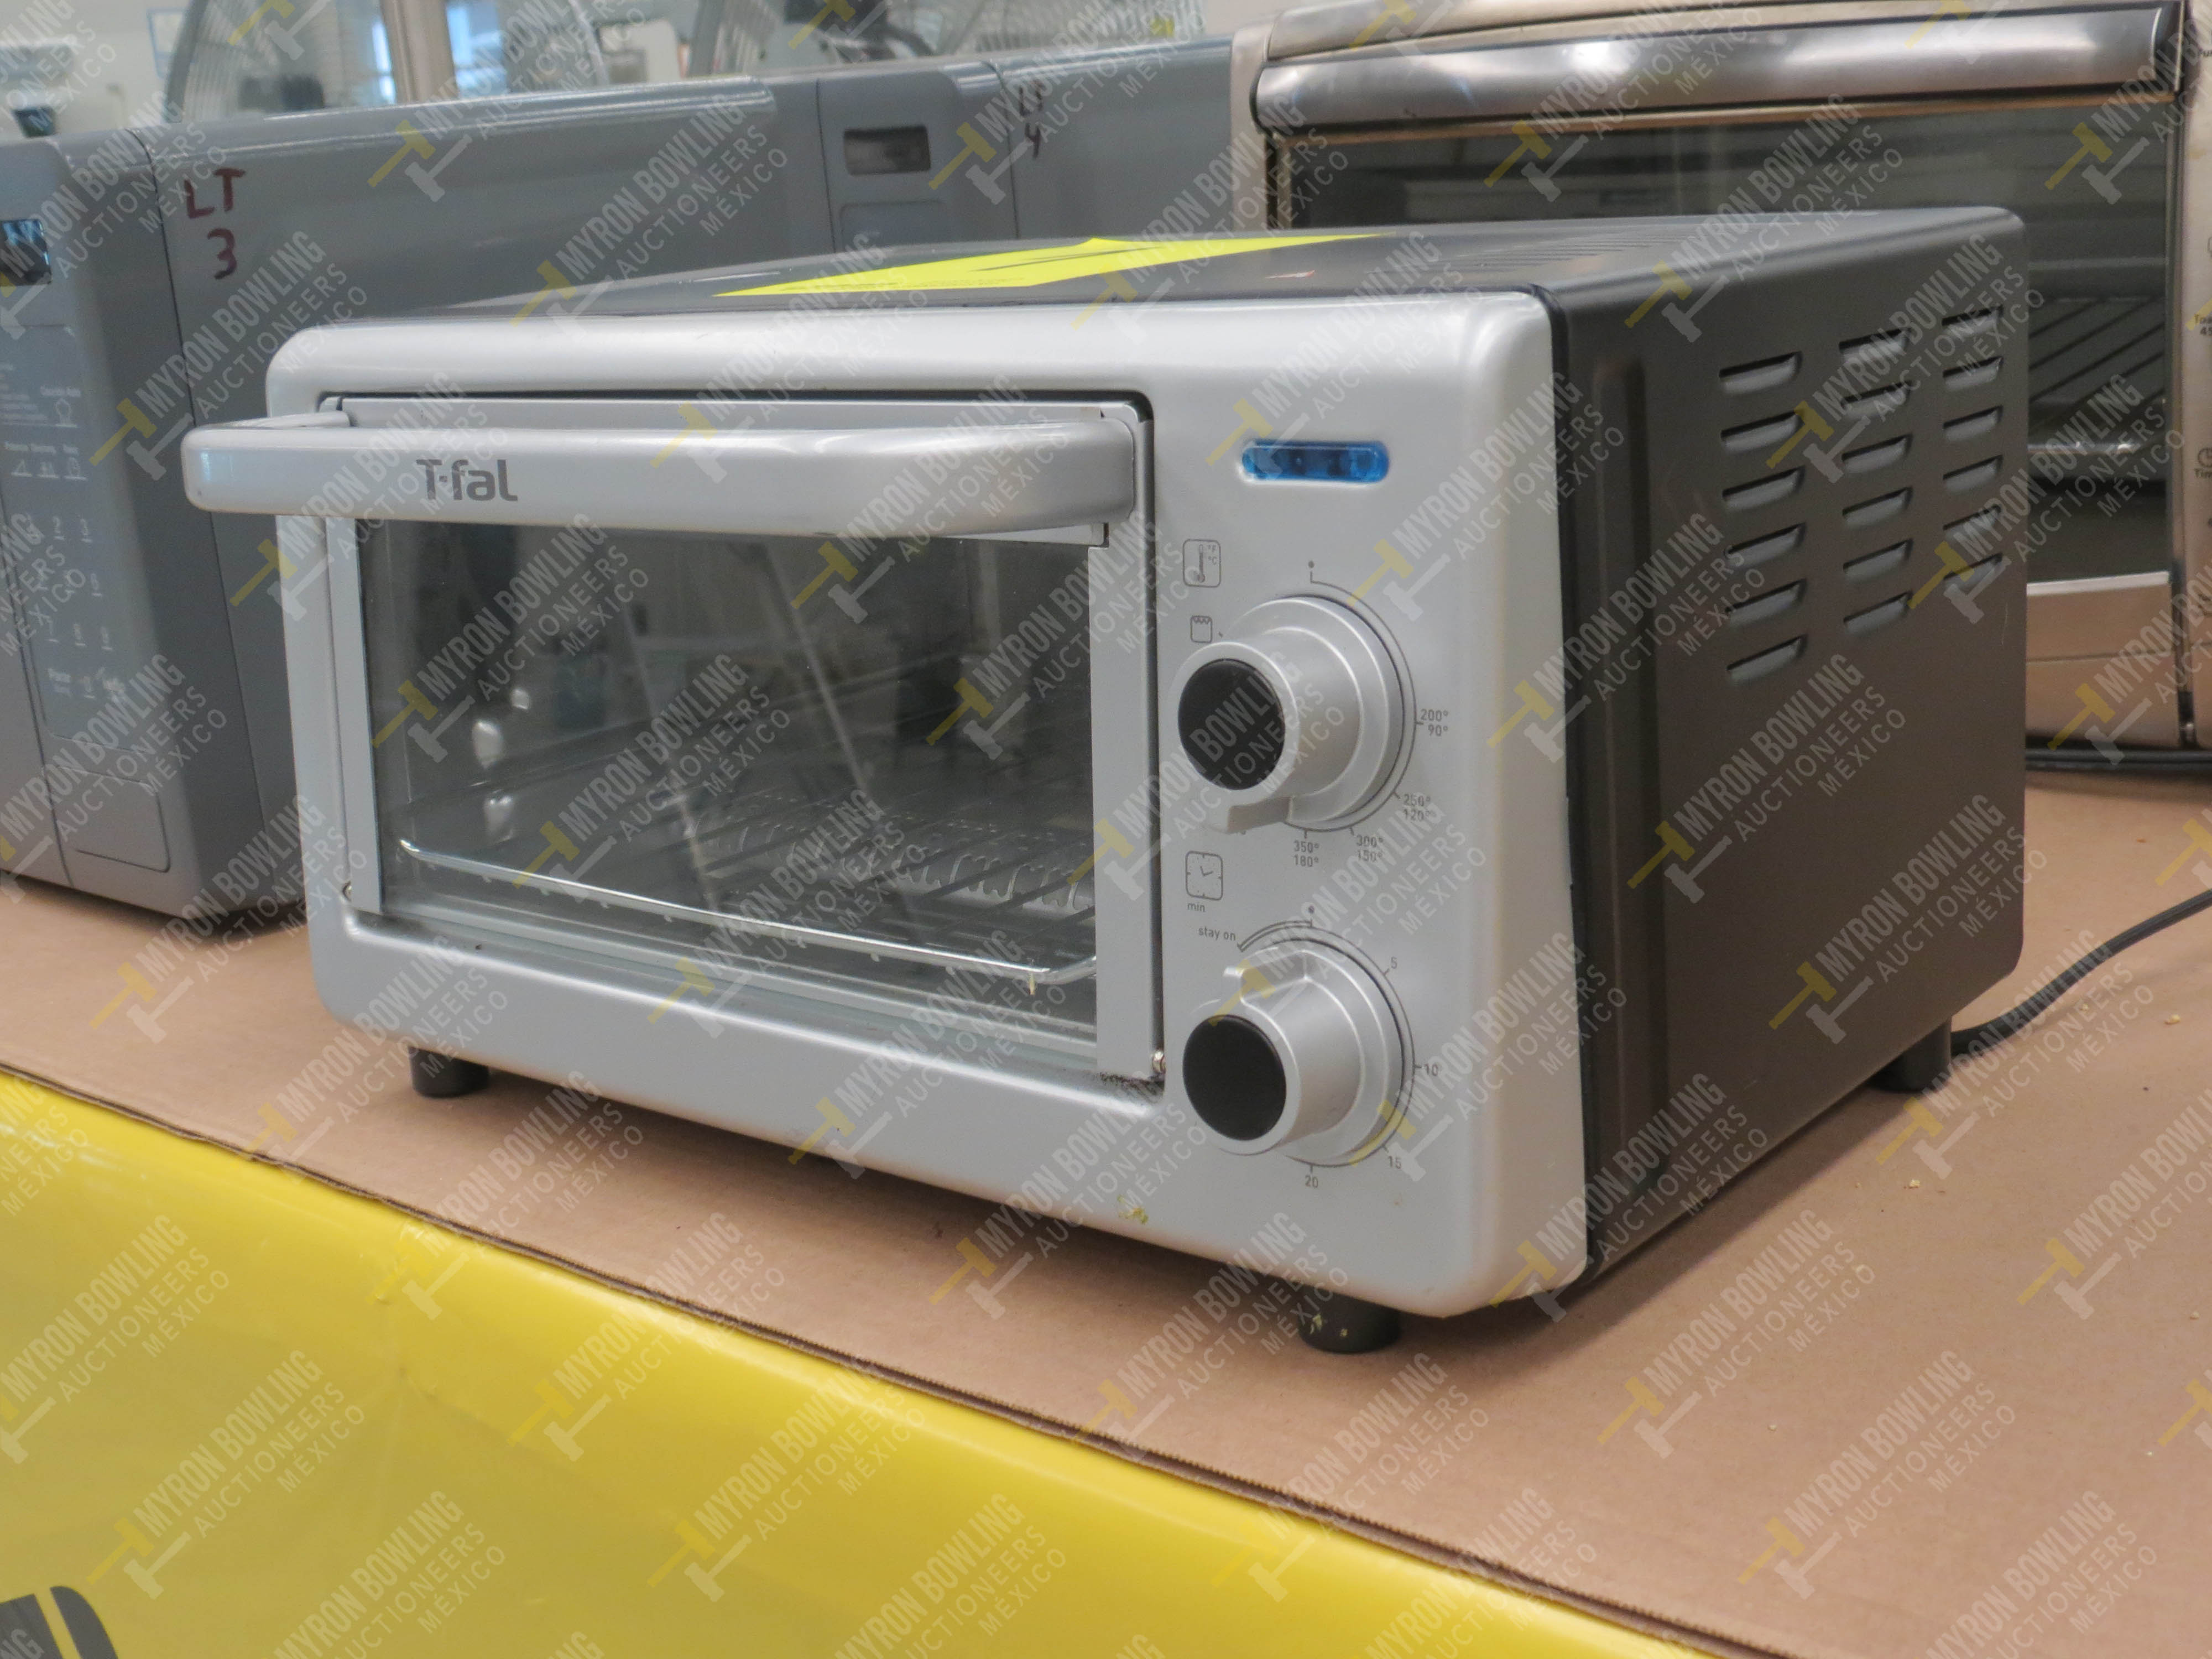 1 Horno eléctrico marca T-fal, Modelo OF160850 No. de Serie T066 y 1 Horno de microondas - Image 2 of 5